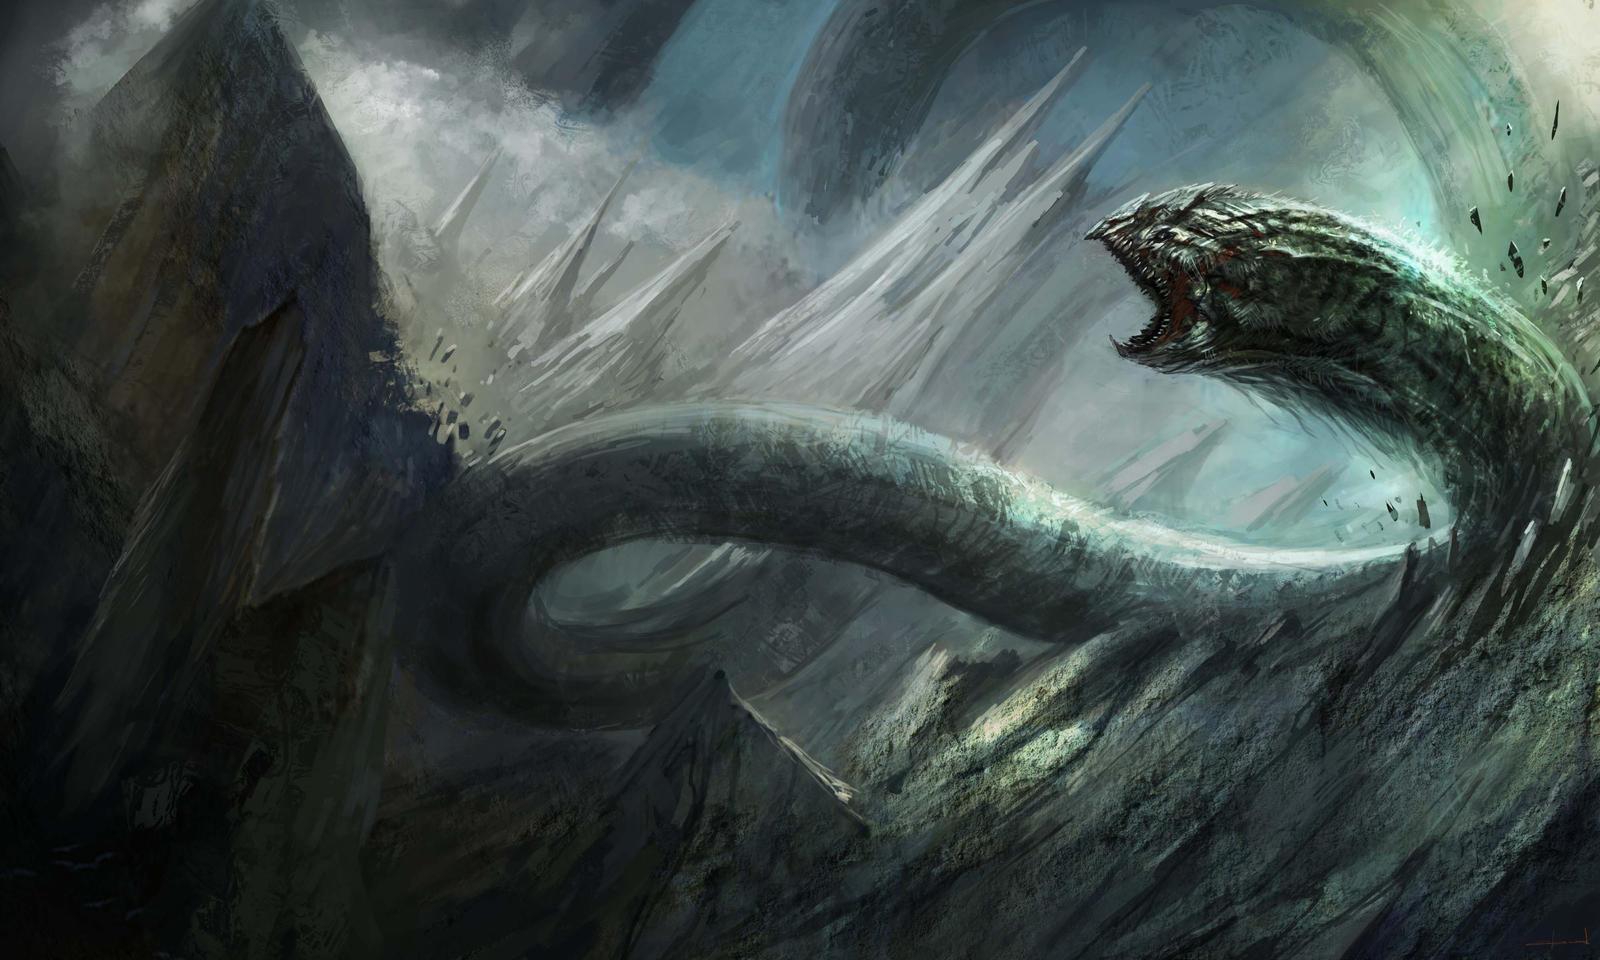 Serpentine by Darkcloud013